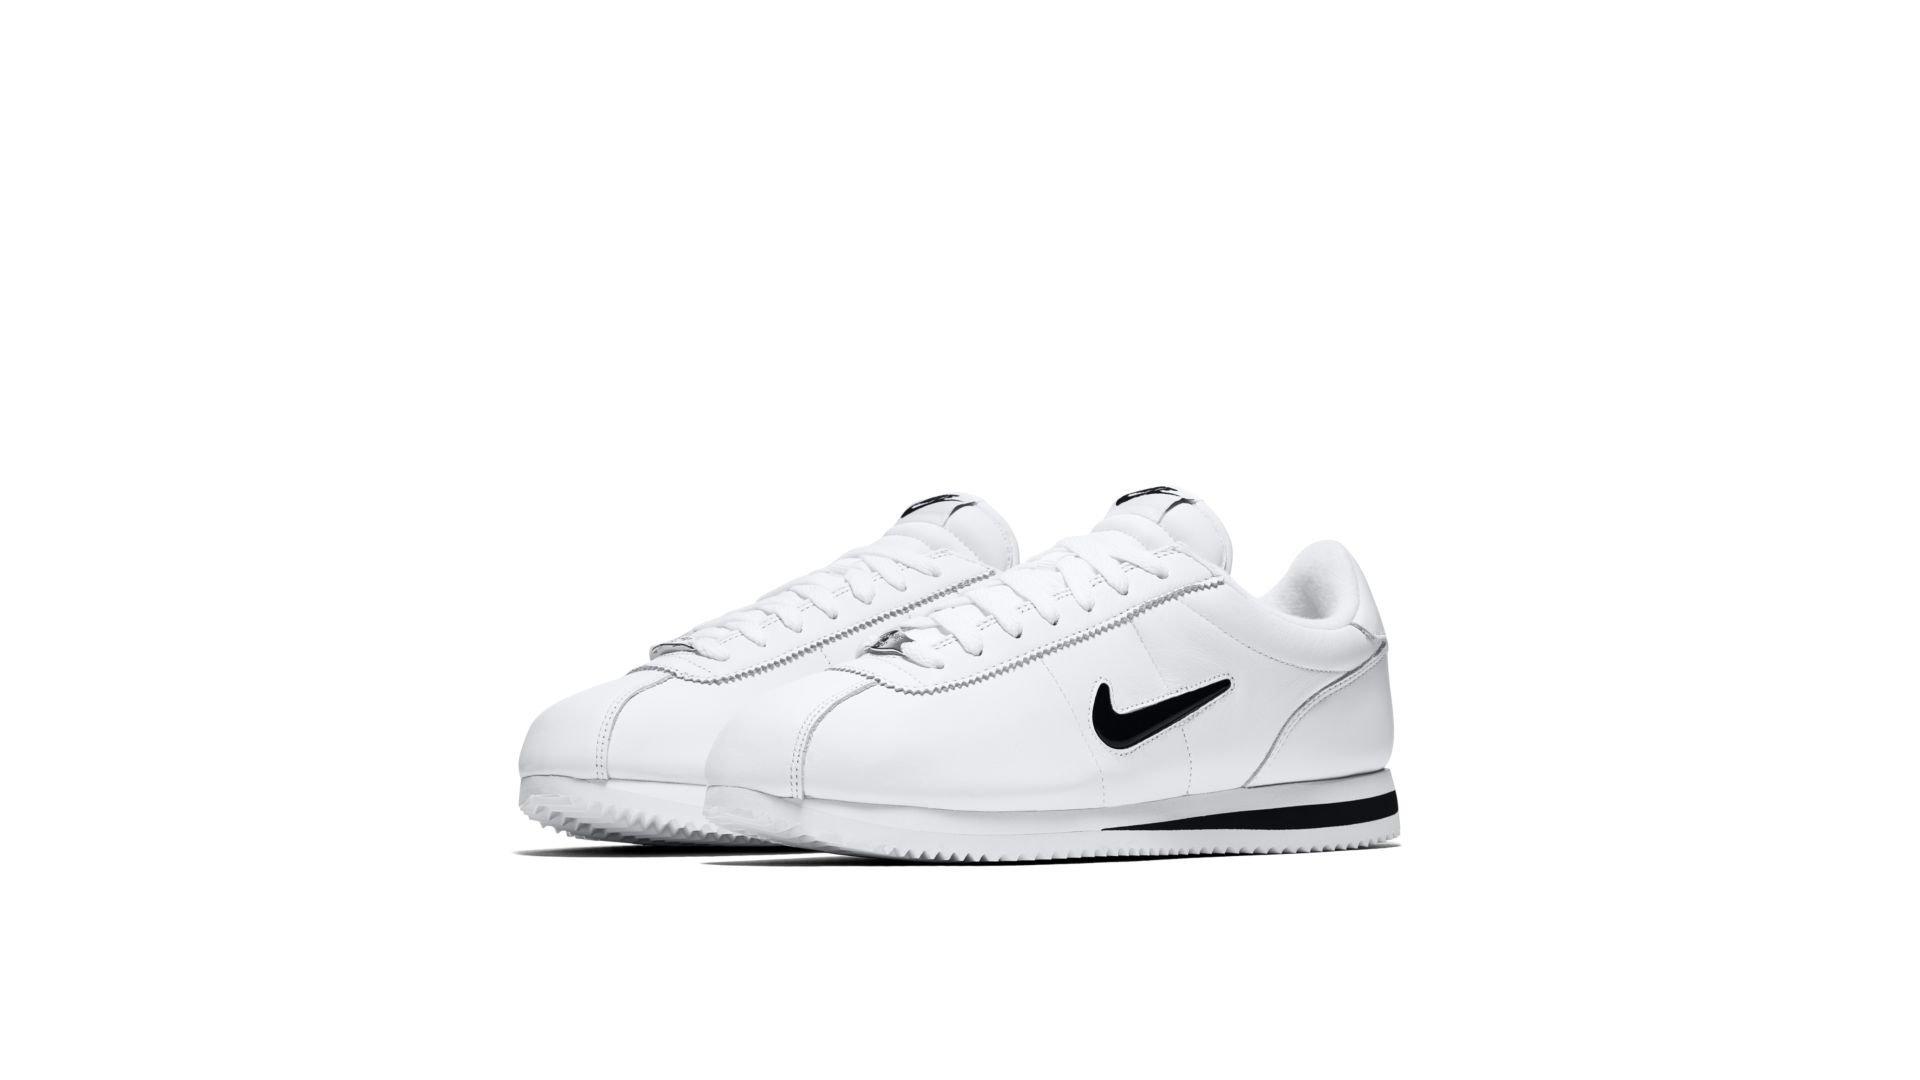 Nike Cortez Jewel Black (938343-101)